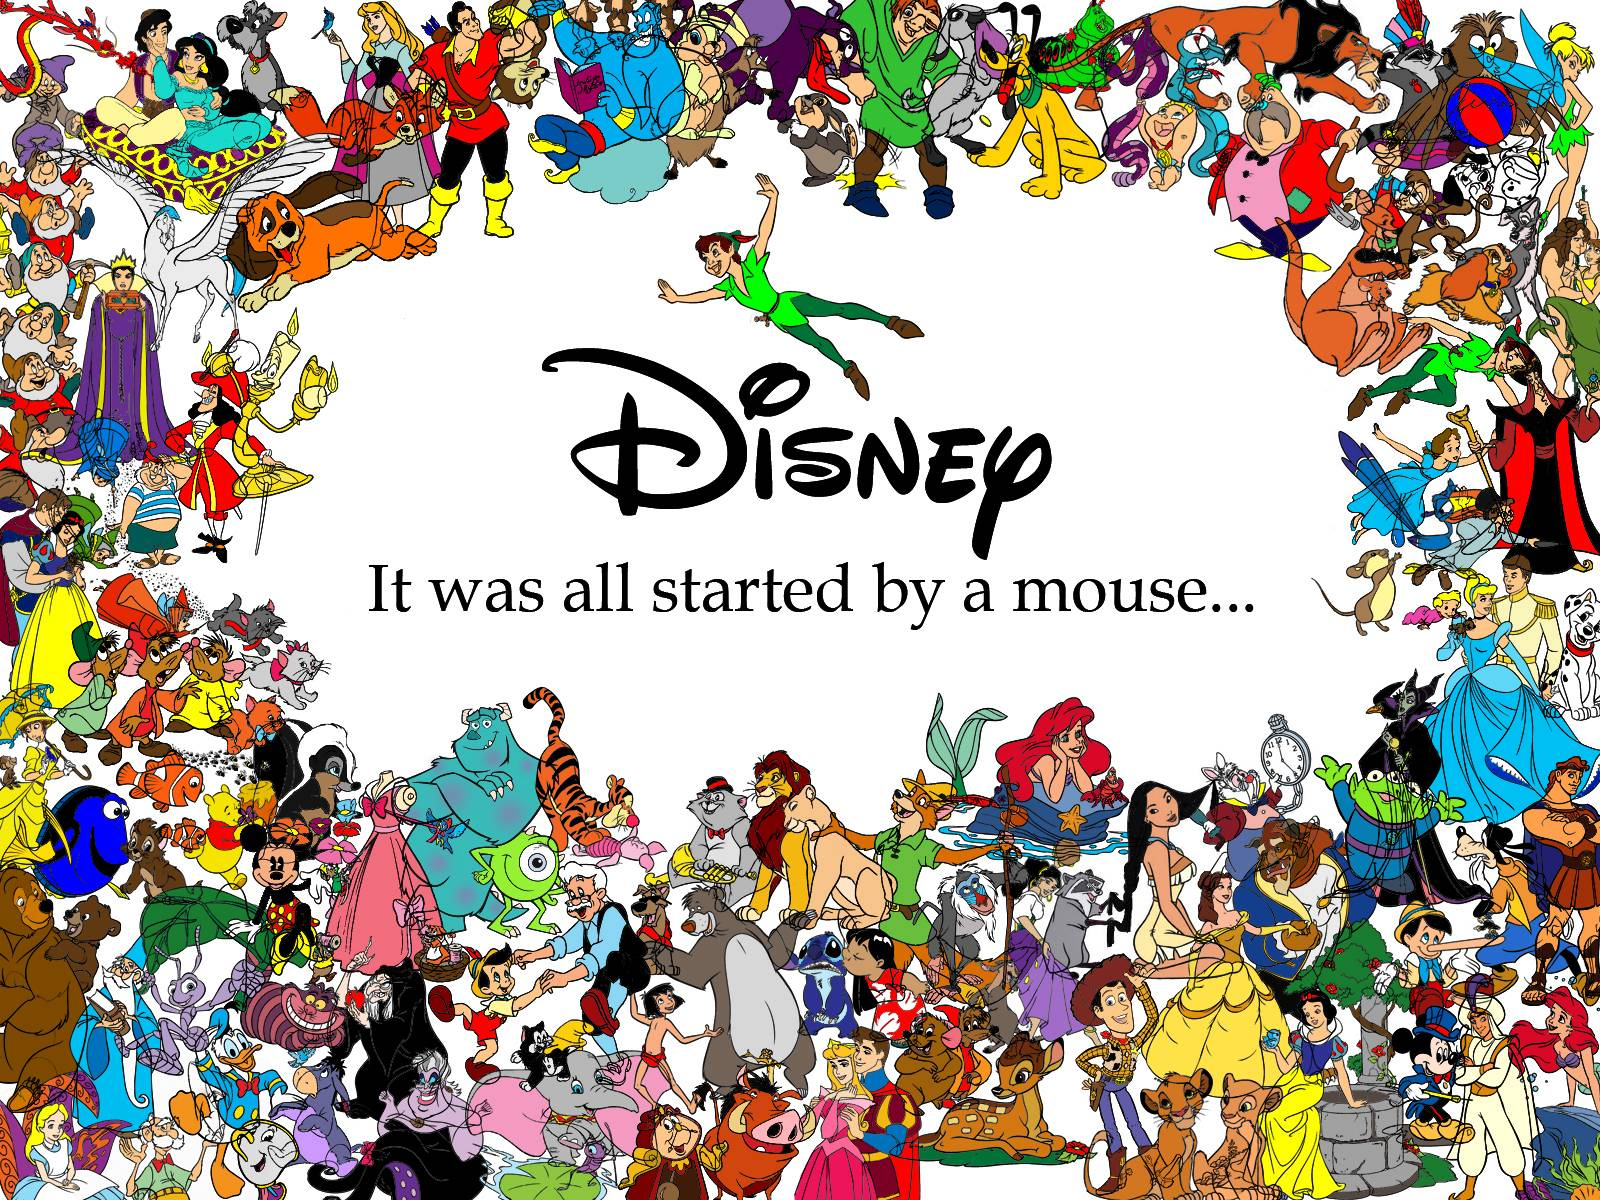 Disney Pixar Wallpapers 1600x1200